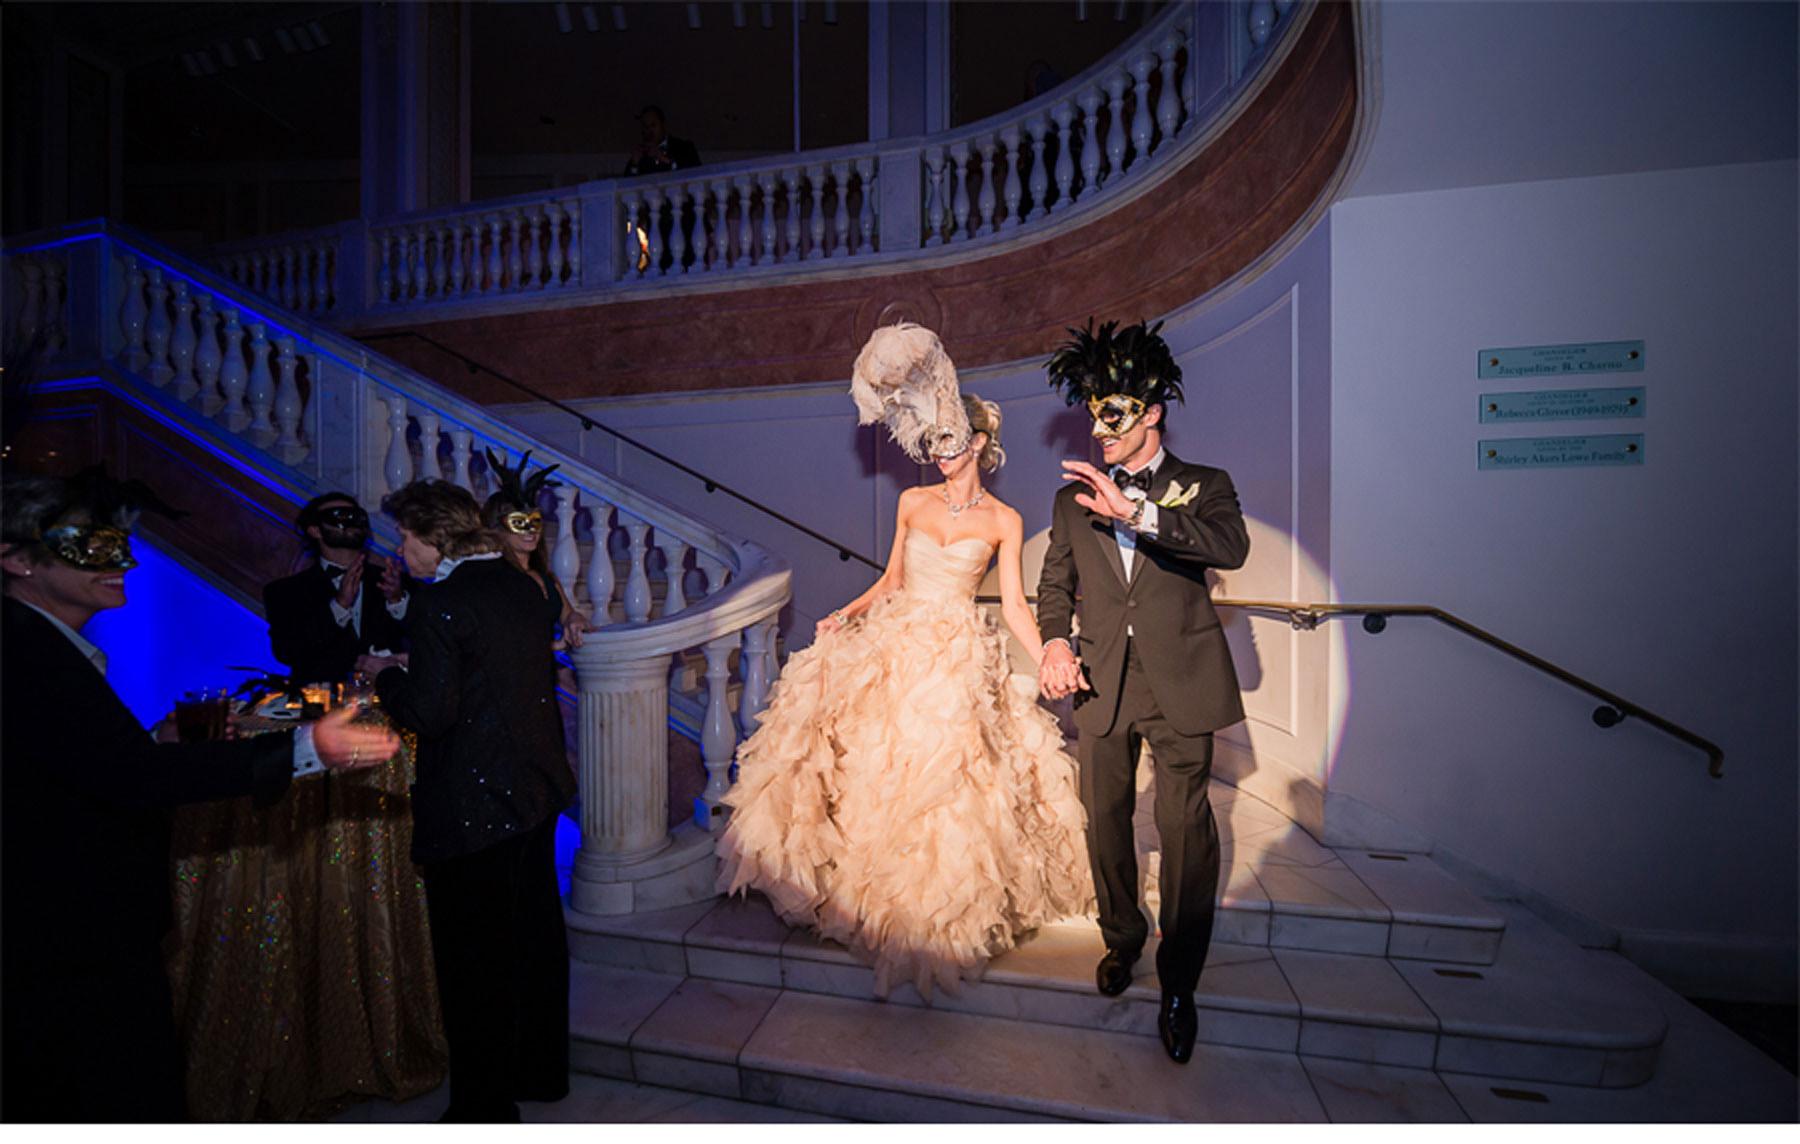 V170 Our Muse Elegant Masquerade Wedding Danielle and